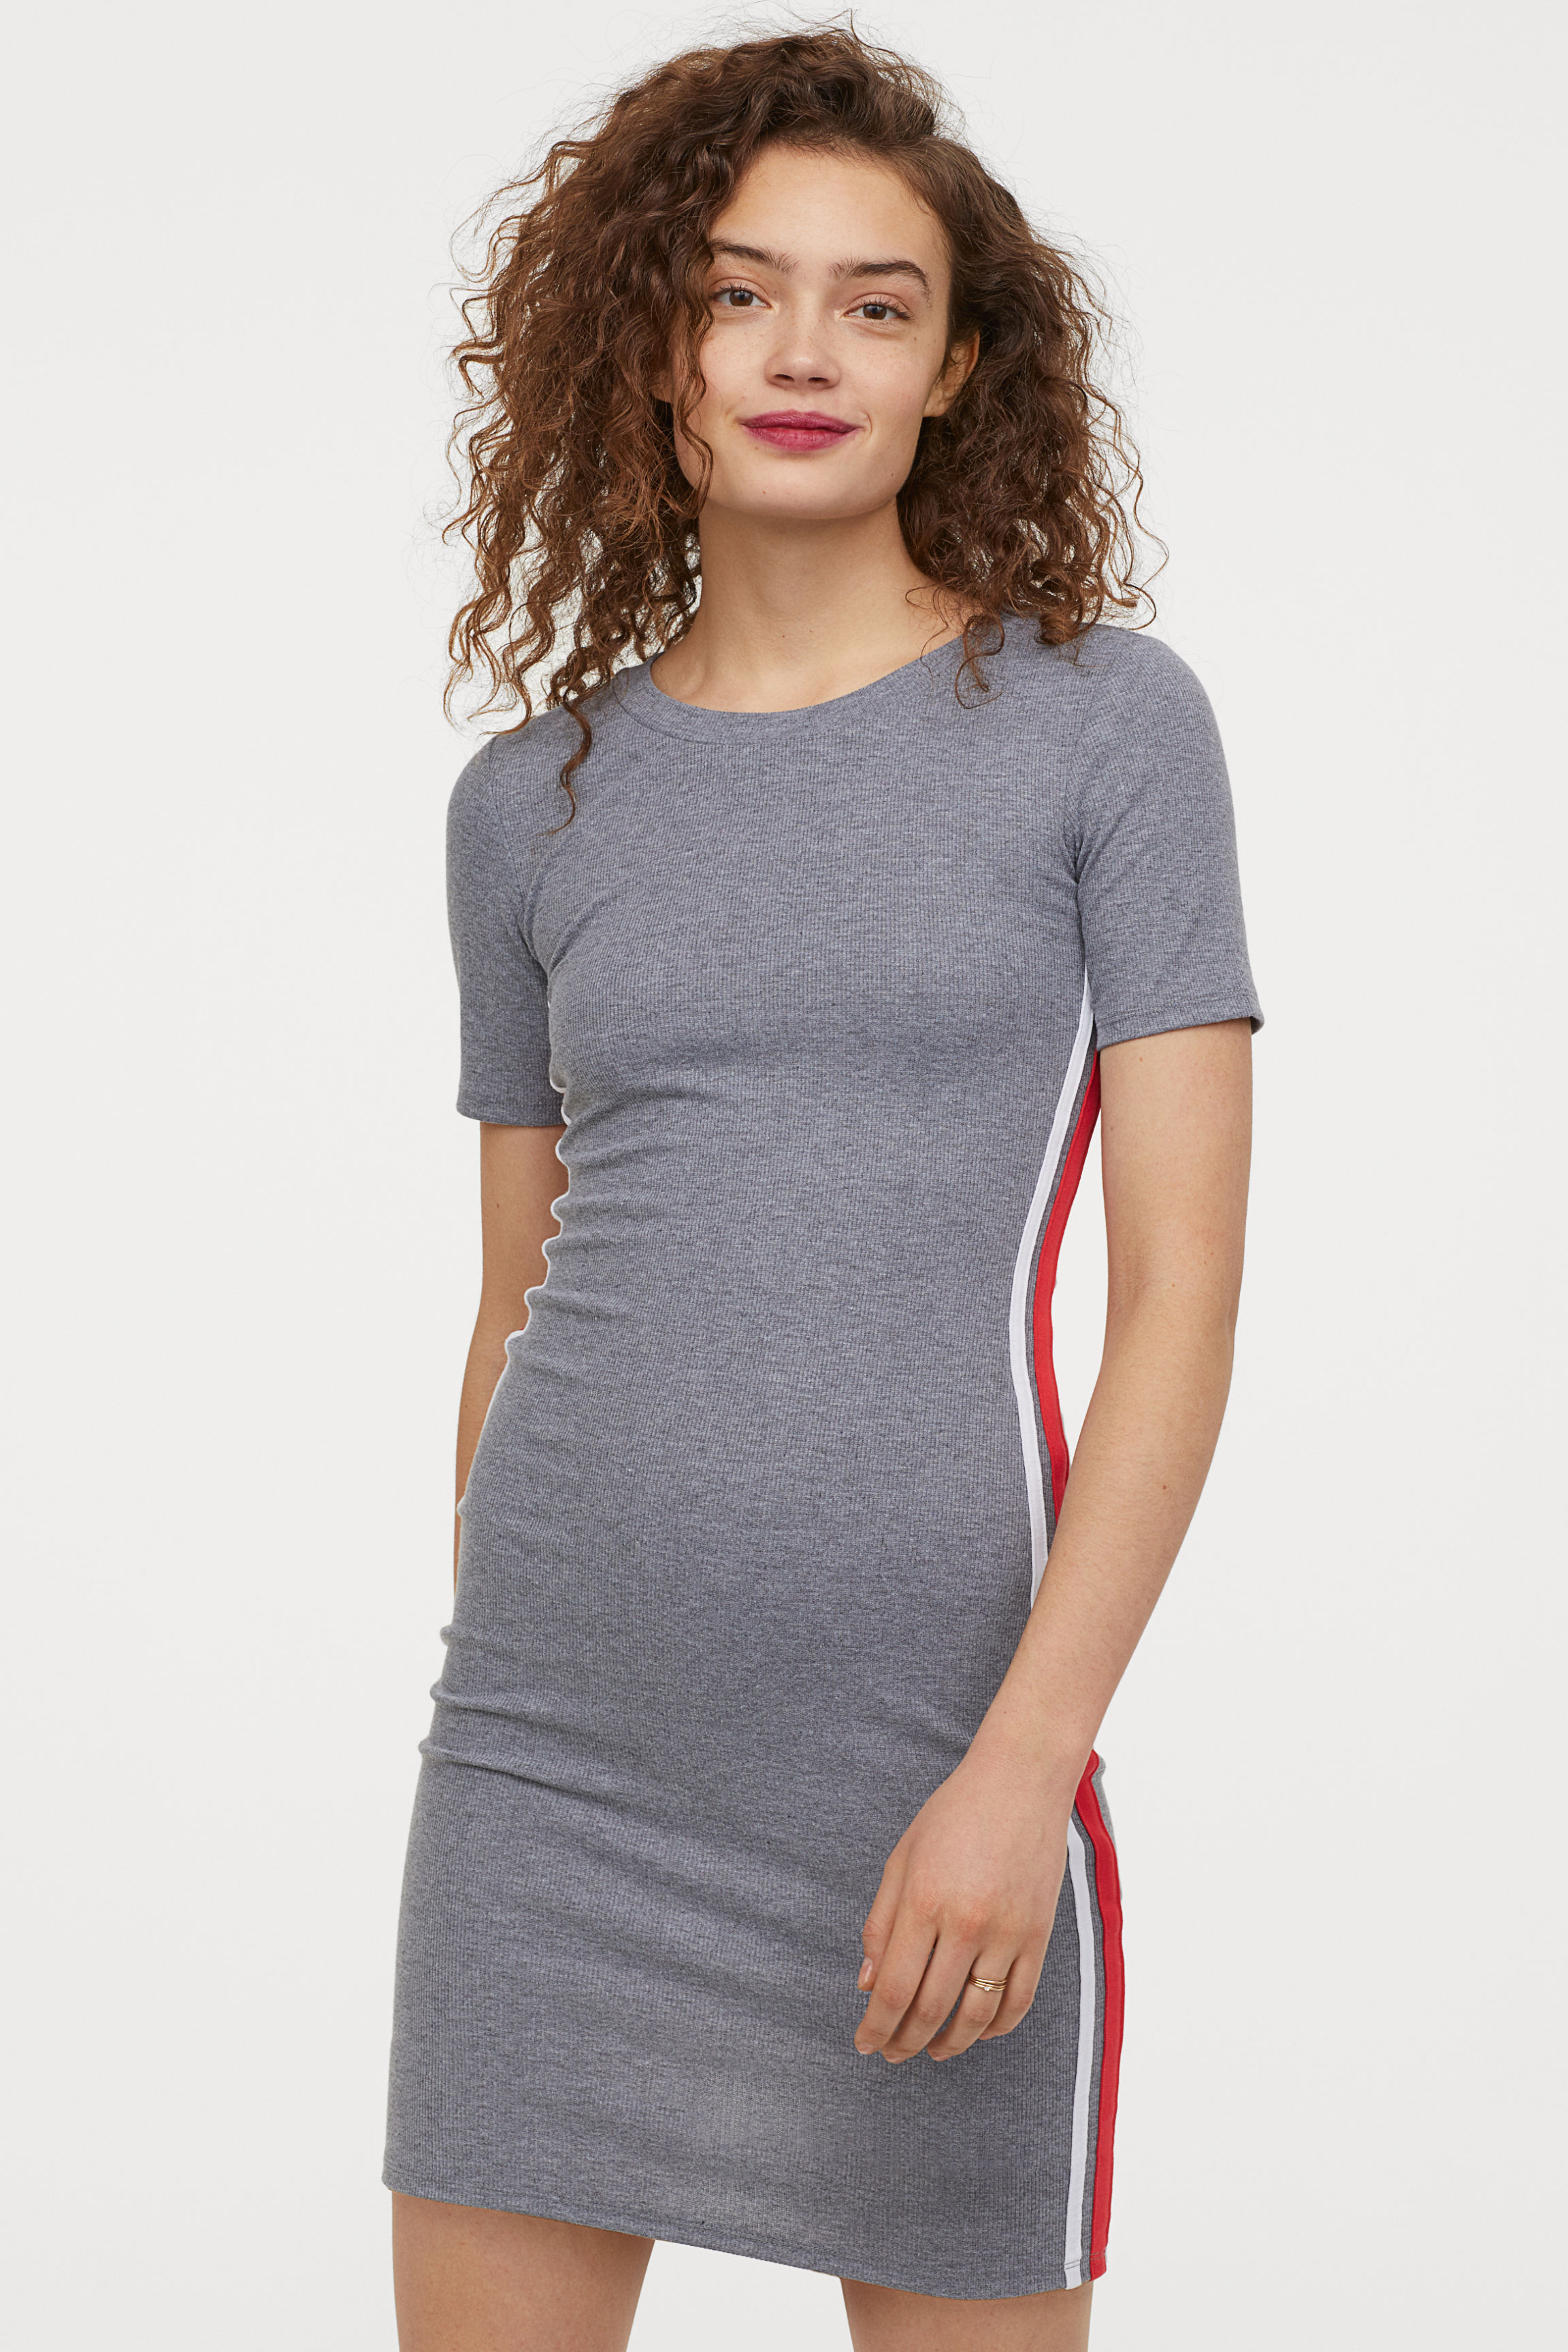 Jersey Dress - Black/red - Ladies | H&M US